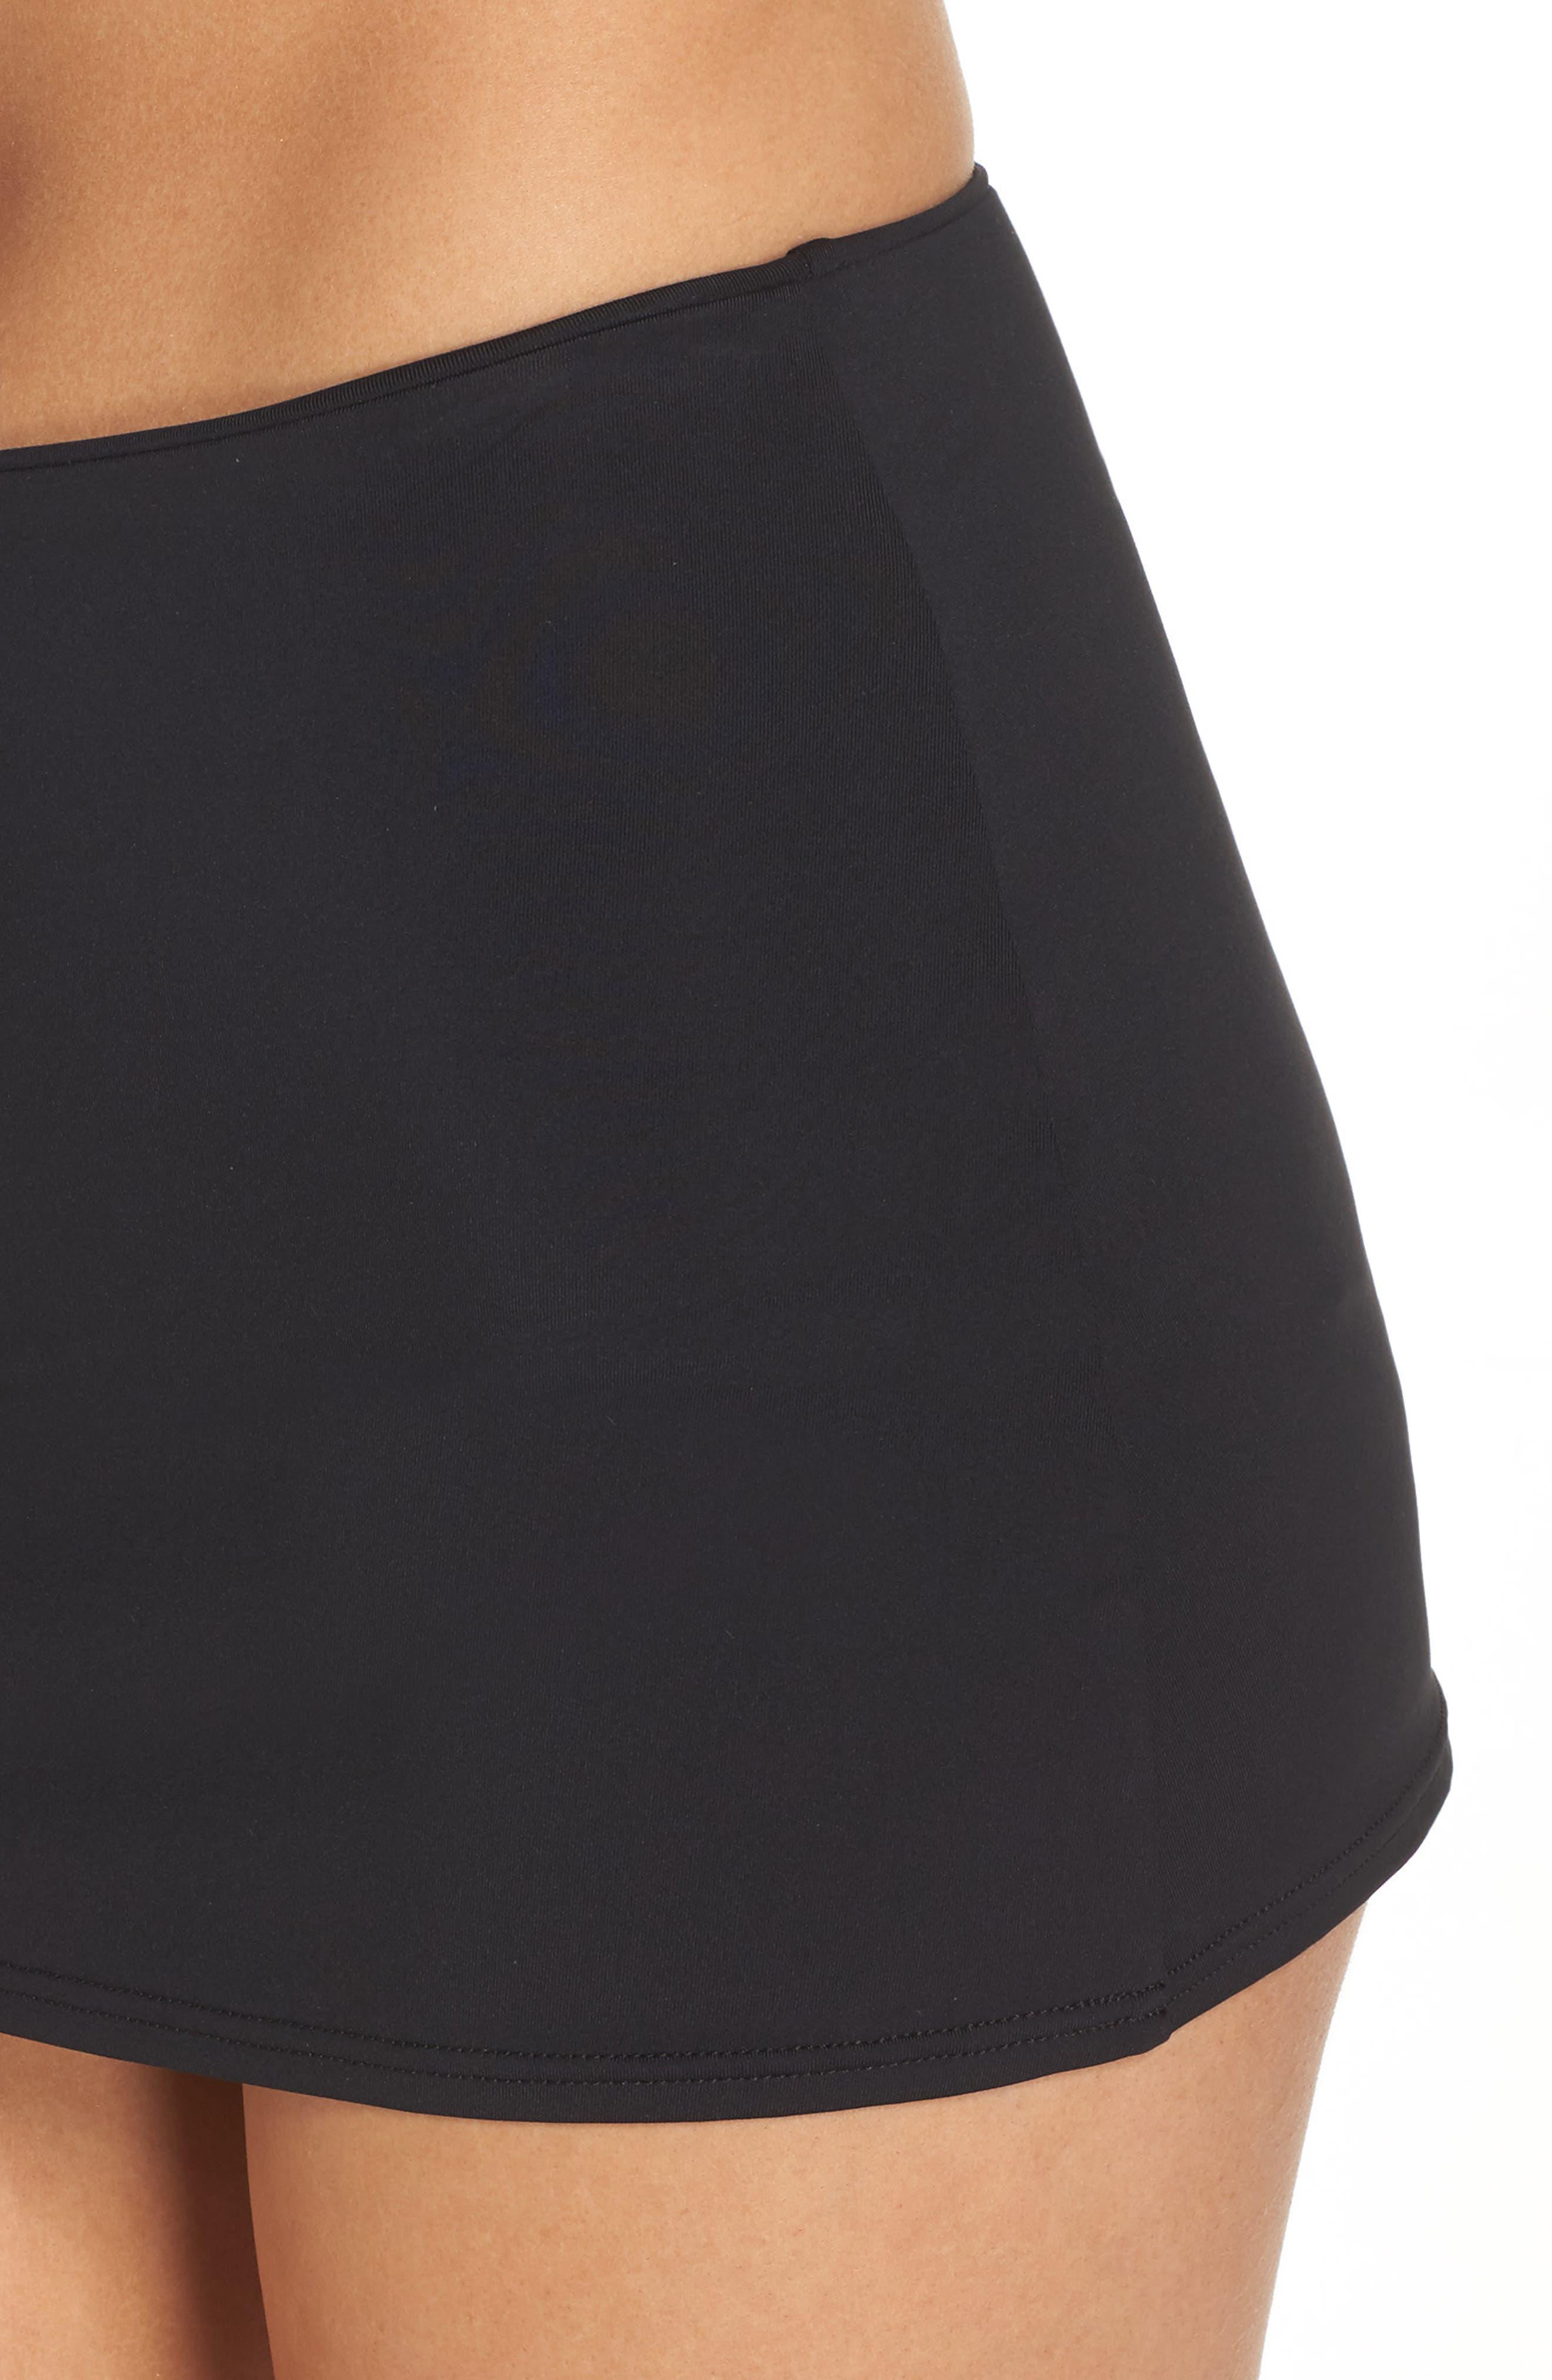 High Waist Bikini Bottoms,                             Alternate thumbnail 4, color,                             Black